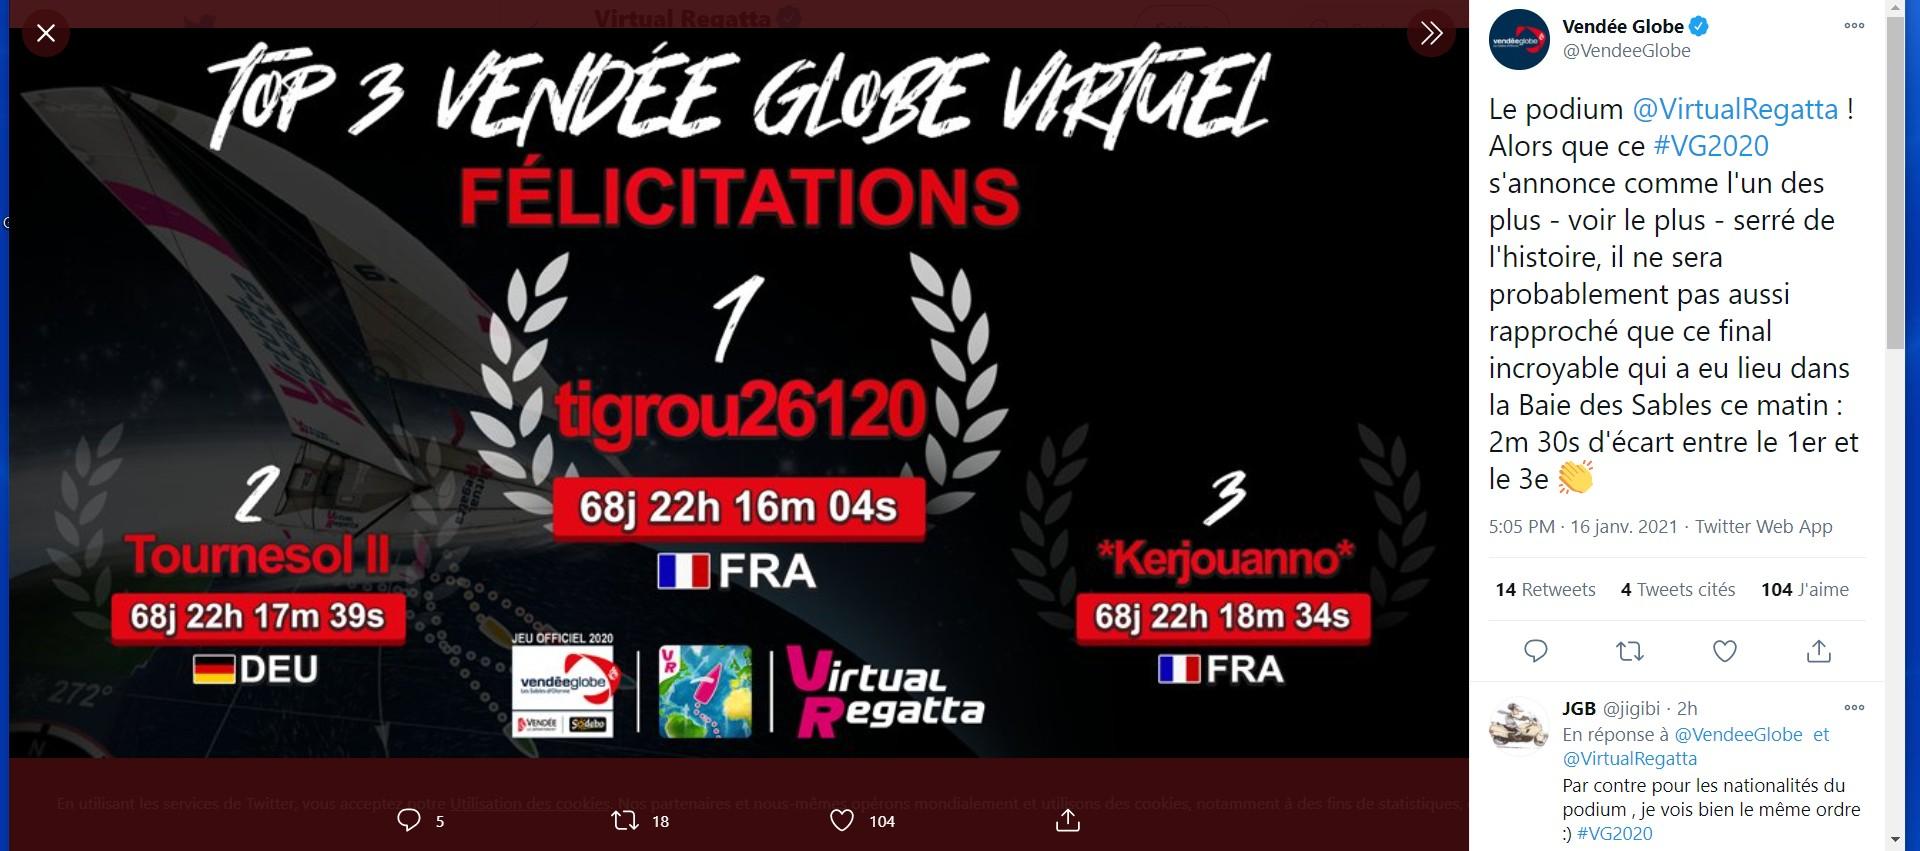 Vendée Globe virtuel: Virtual Regatta, édition 2020 - Page 2 Captur88